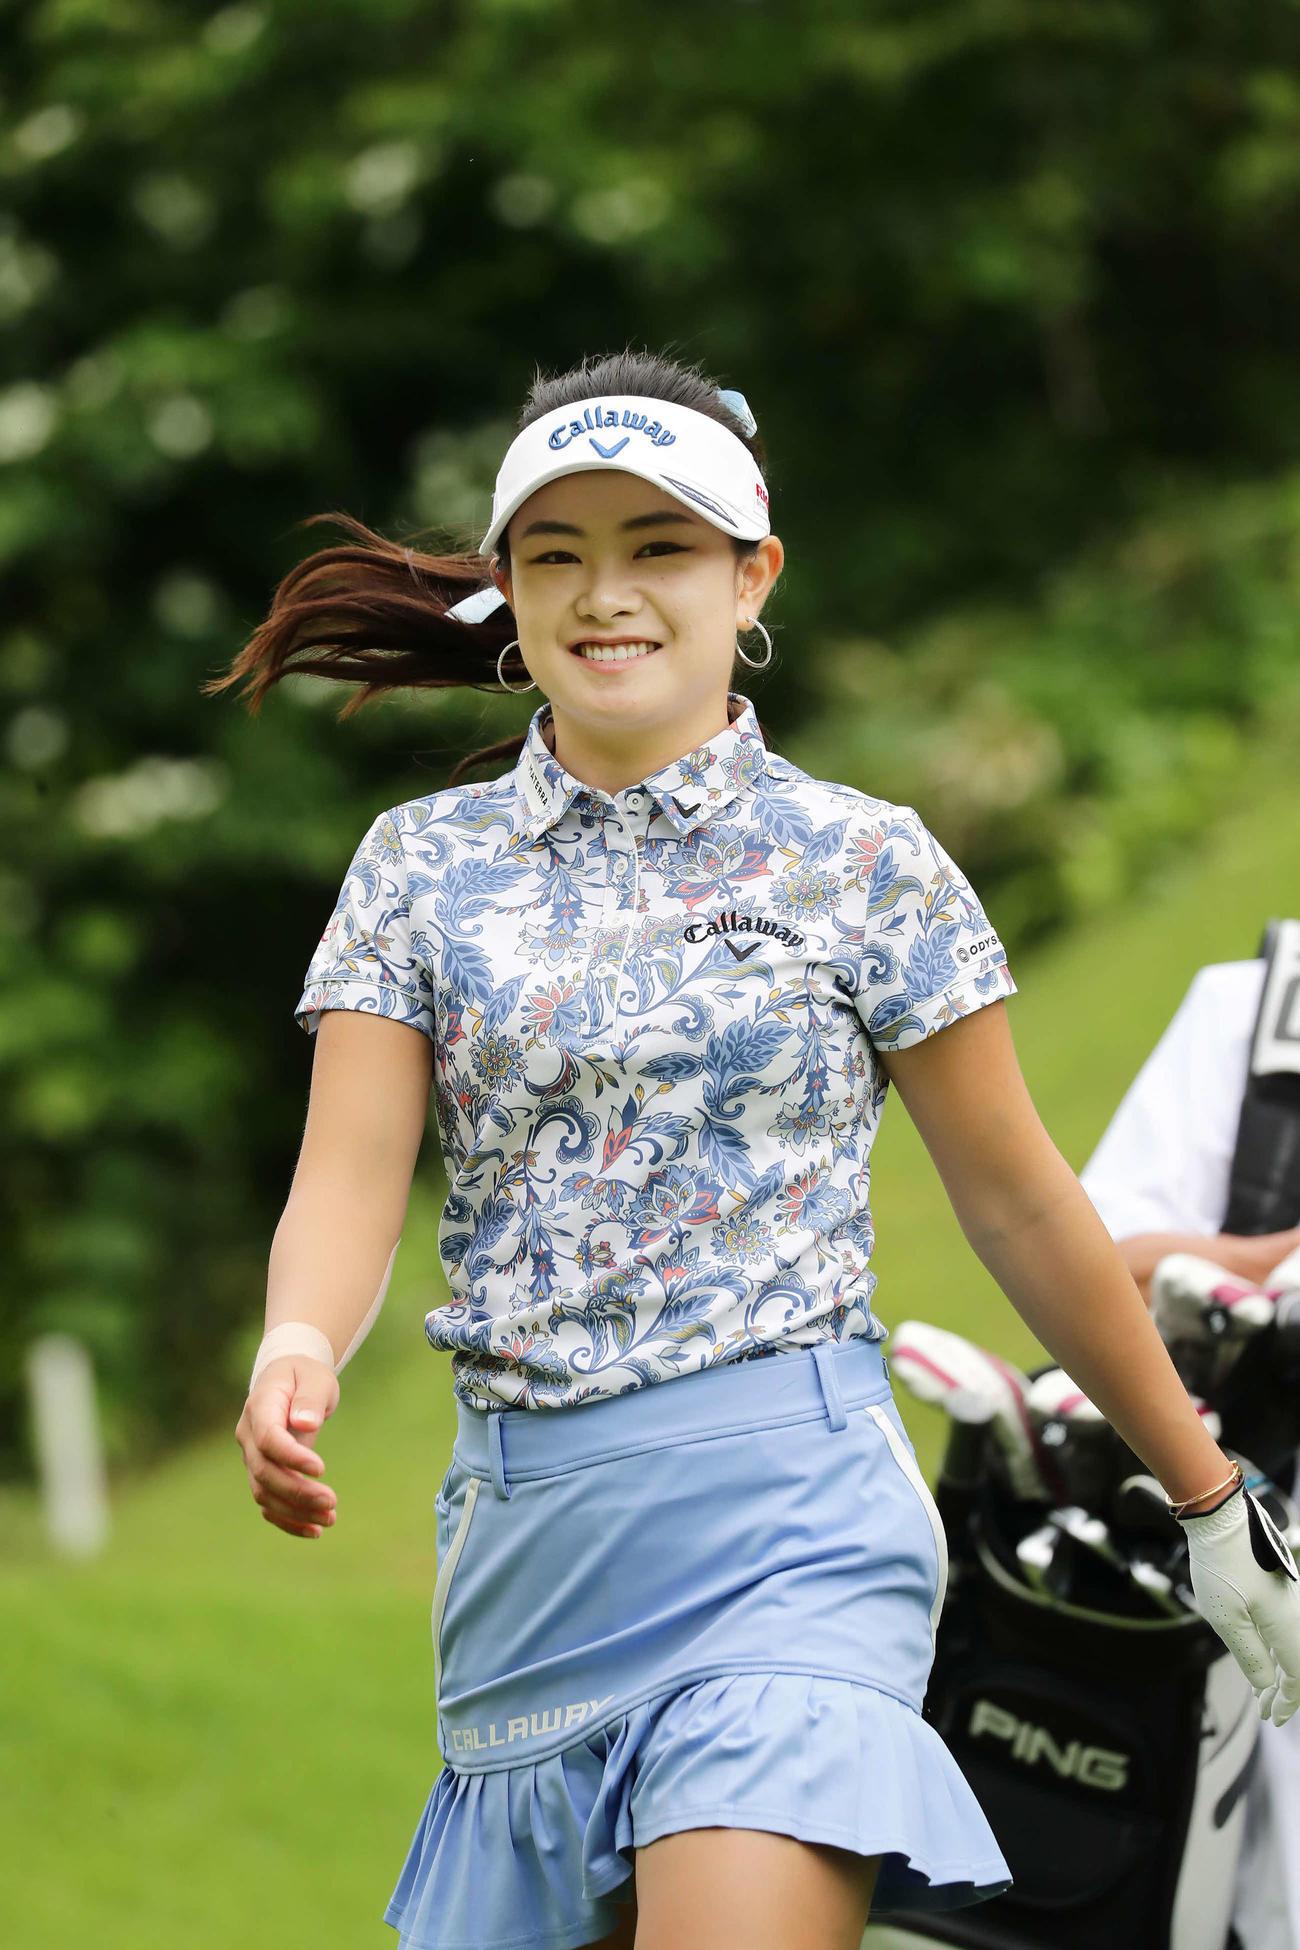 https://www.nikkansports.com/sports/golf/news/img/202106060000024-w1300_8.jpg